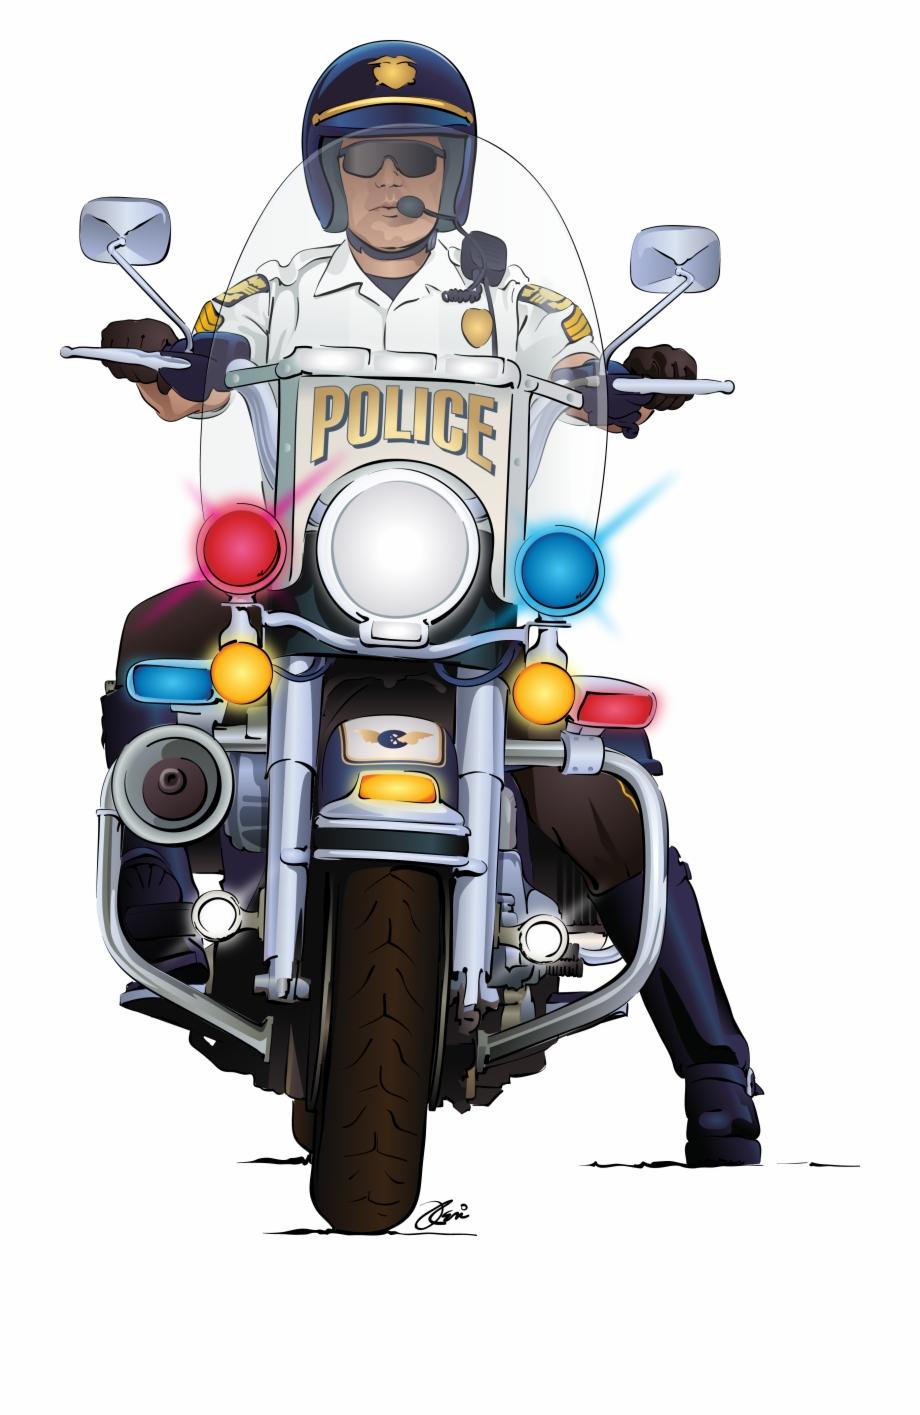 Cop Clipart Motorcycle Cop Cop Motorcycle Cop Transparent